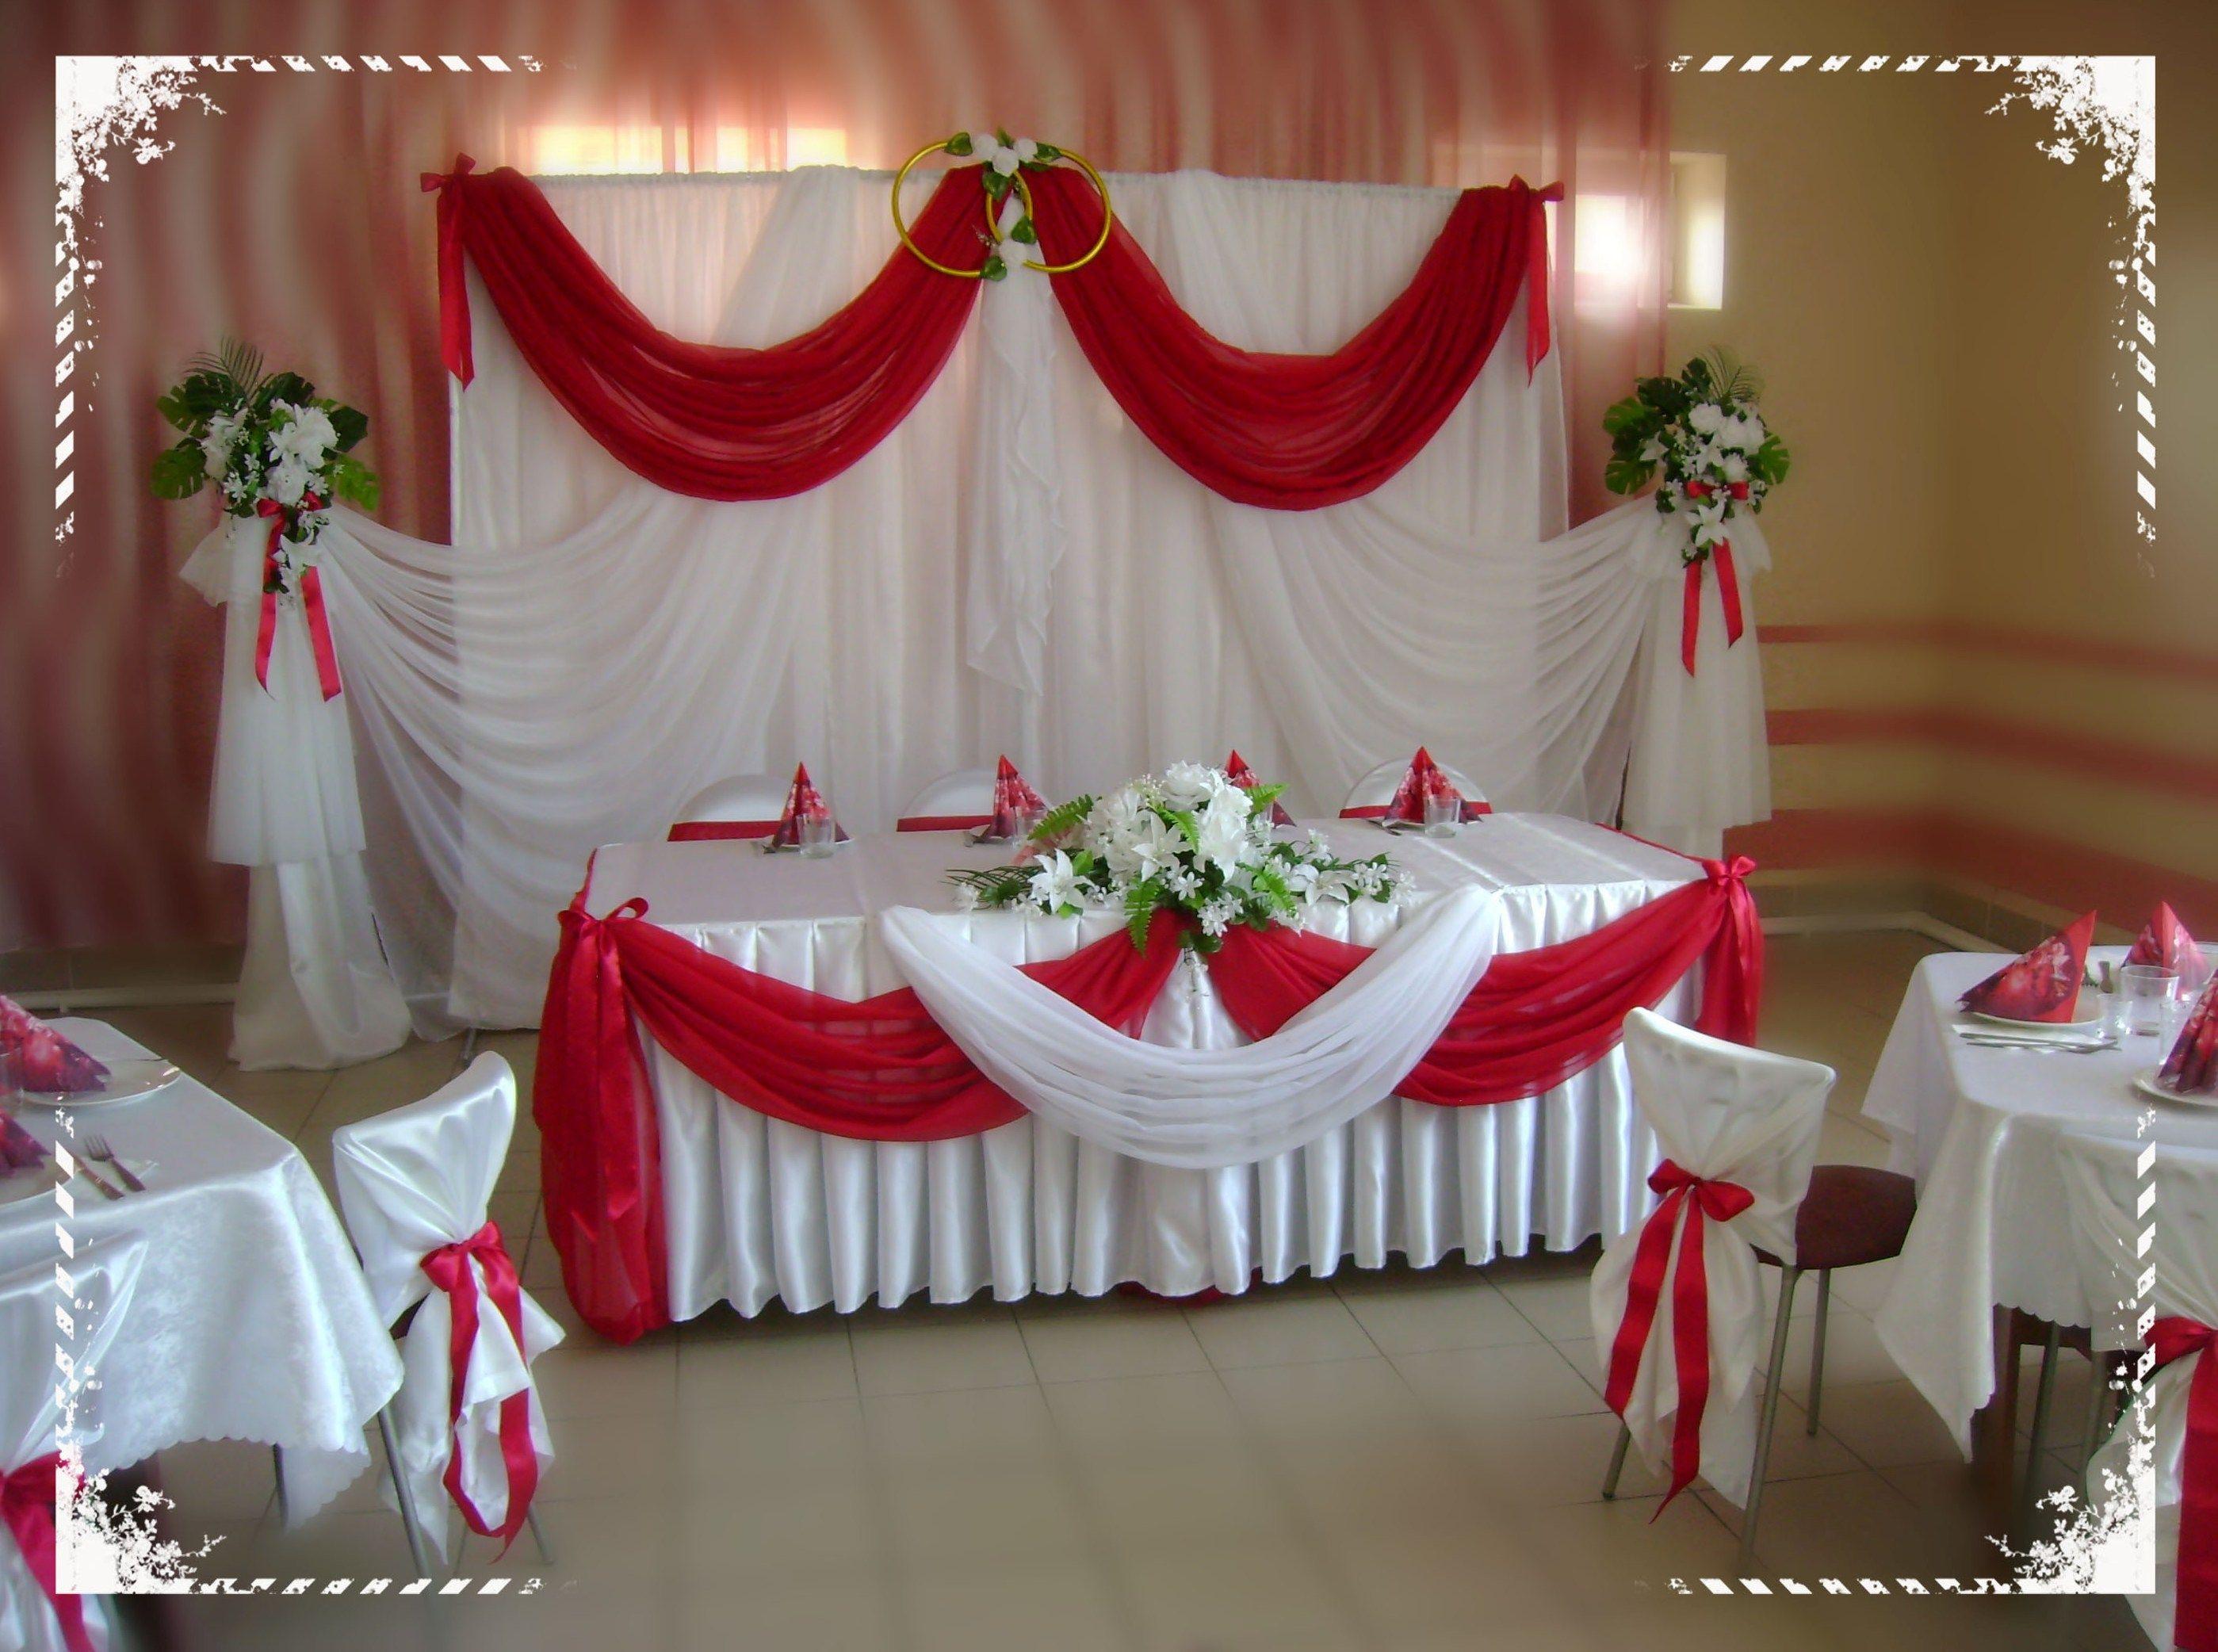 Wedding decorations backdrop  место молодых  mesas principales  Pinterest  Backdrops